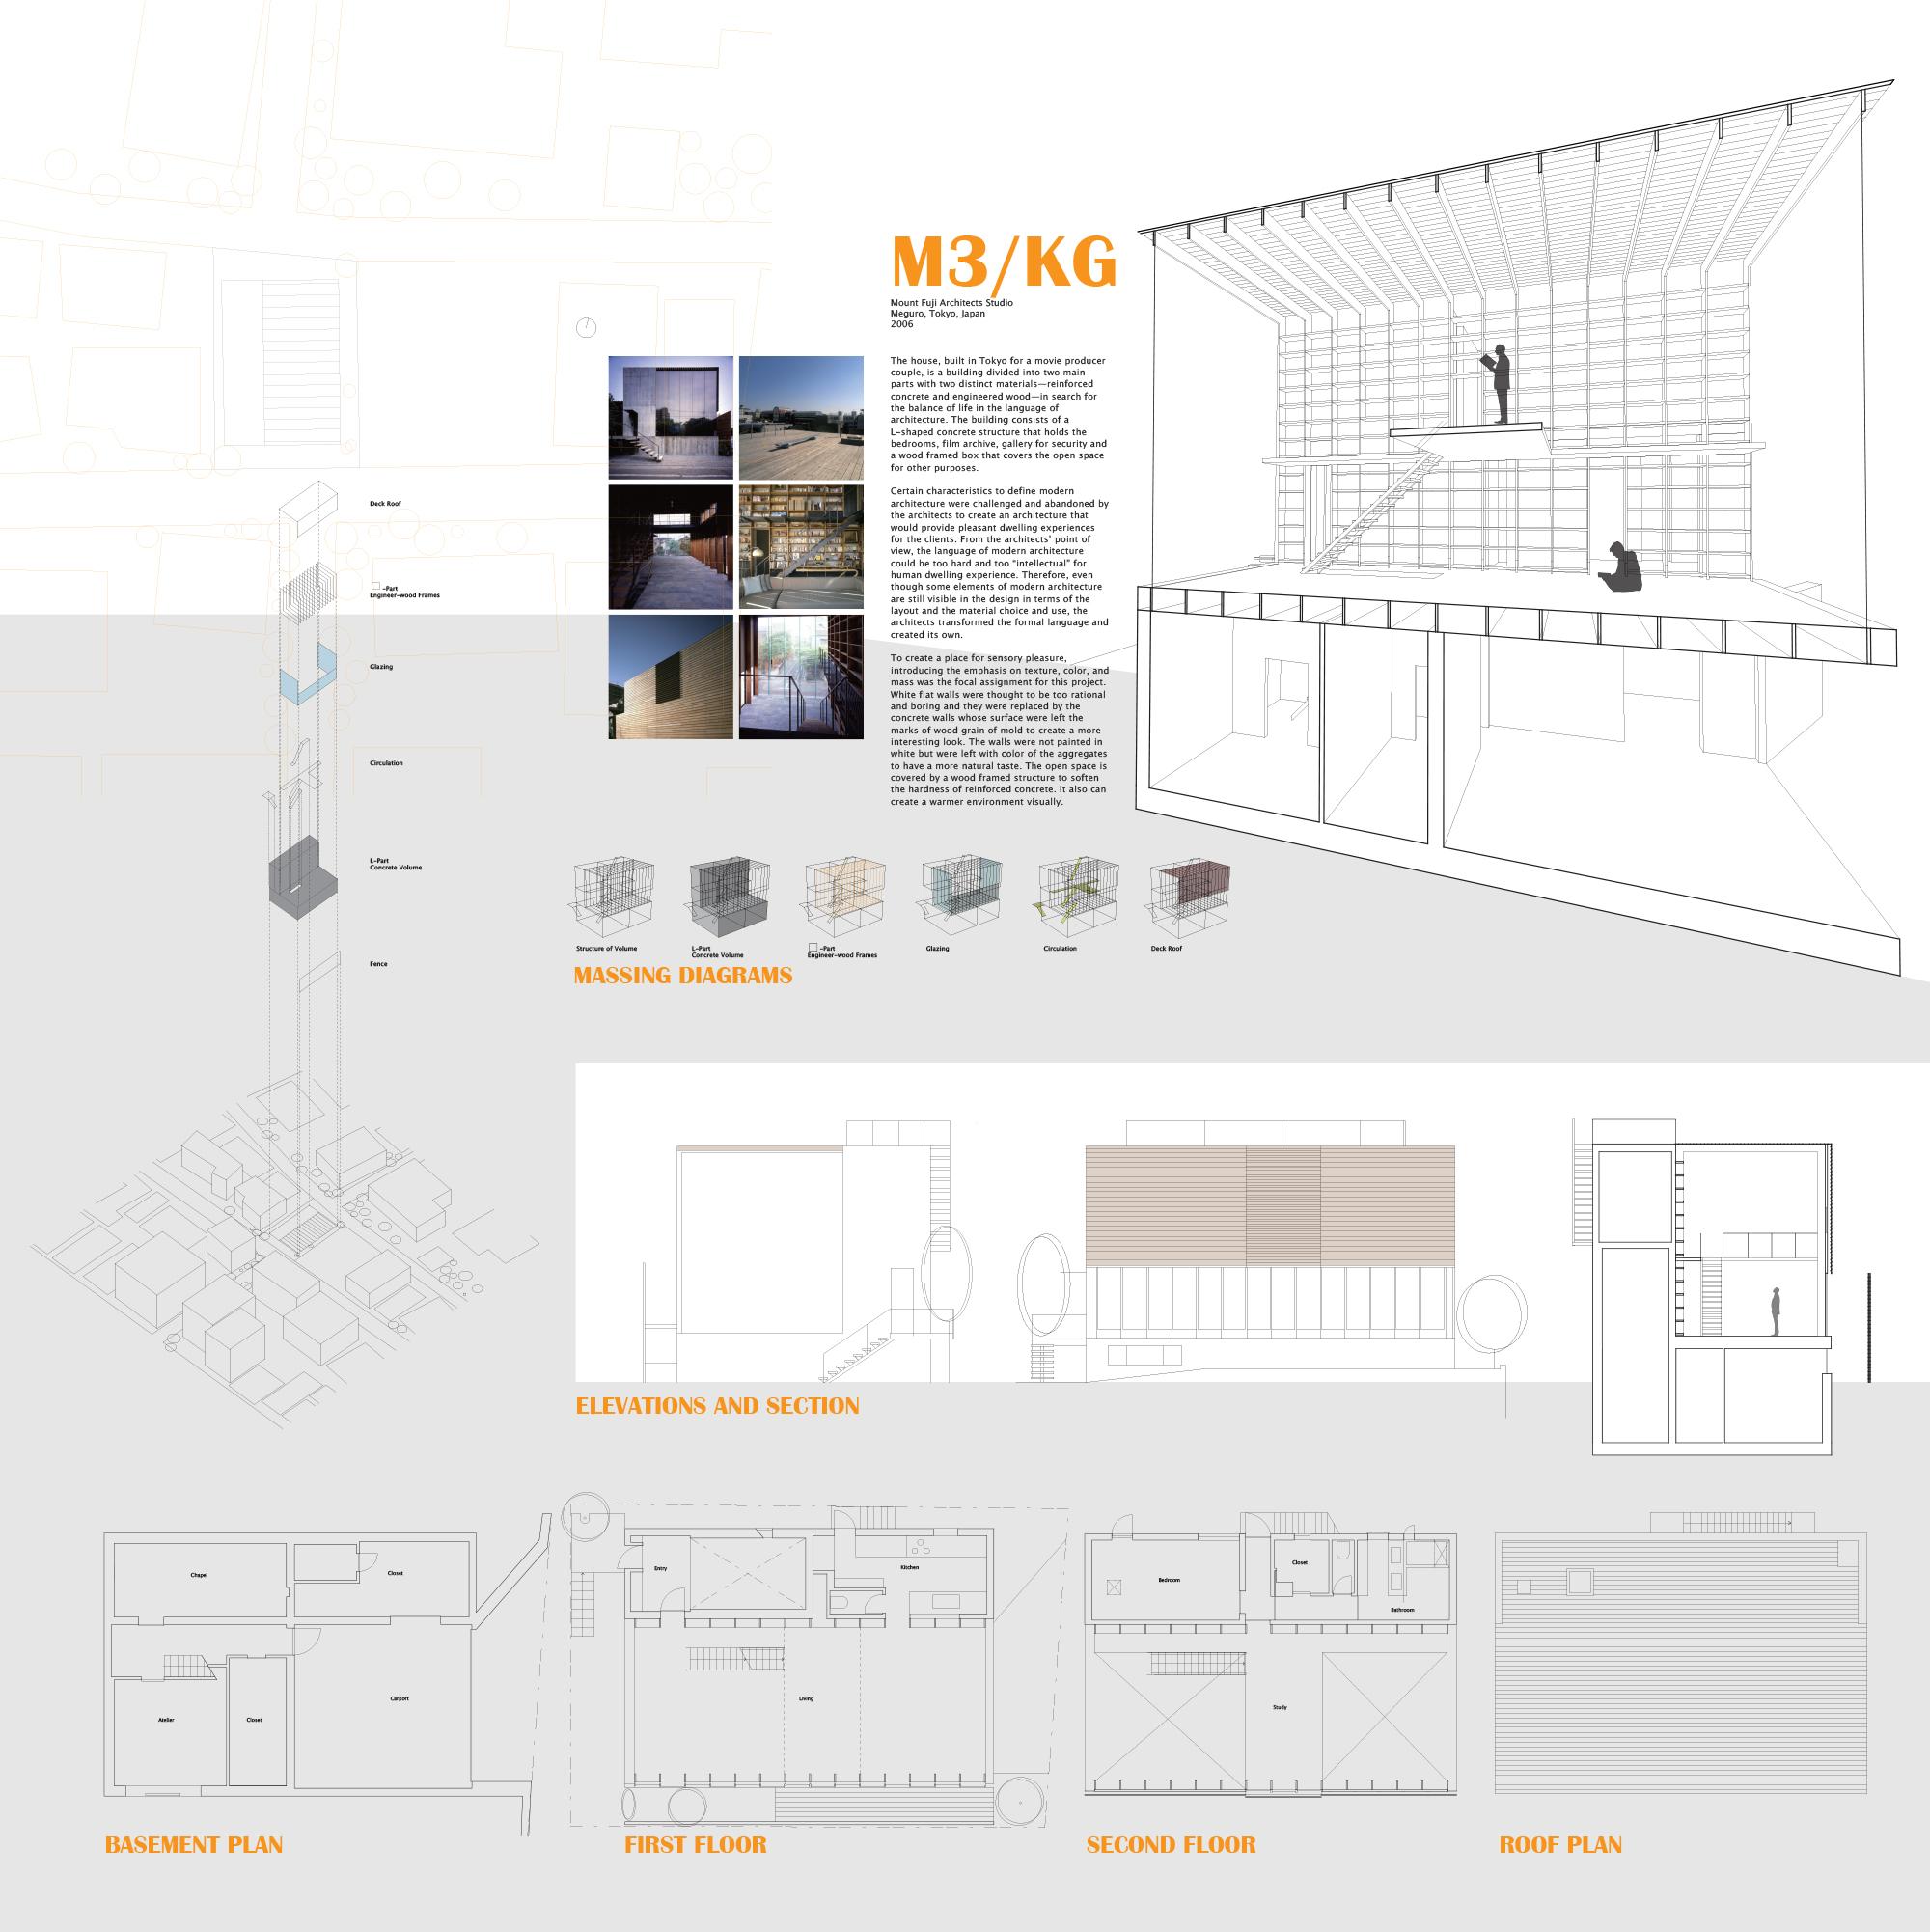 M3/KG, Mount Fuji Architects Studio, Yu-Hsuan Tung, Ach 124A, UC Berkeley